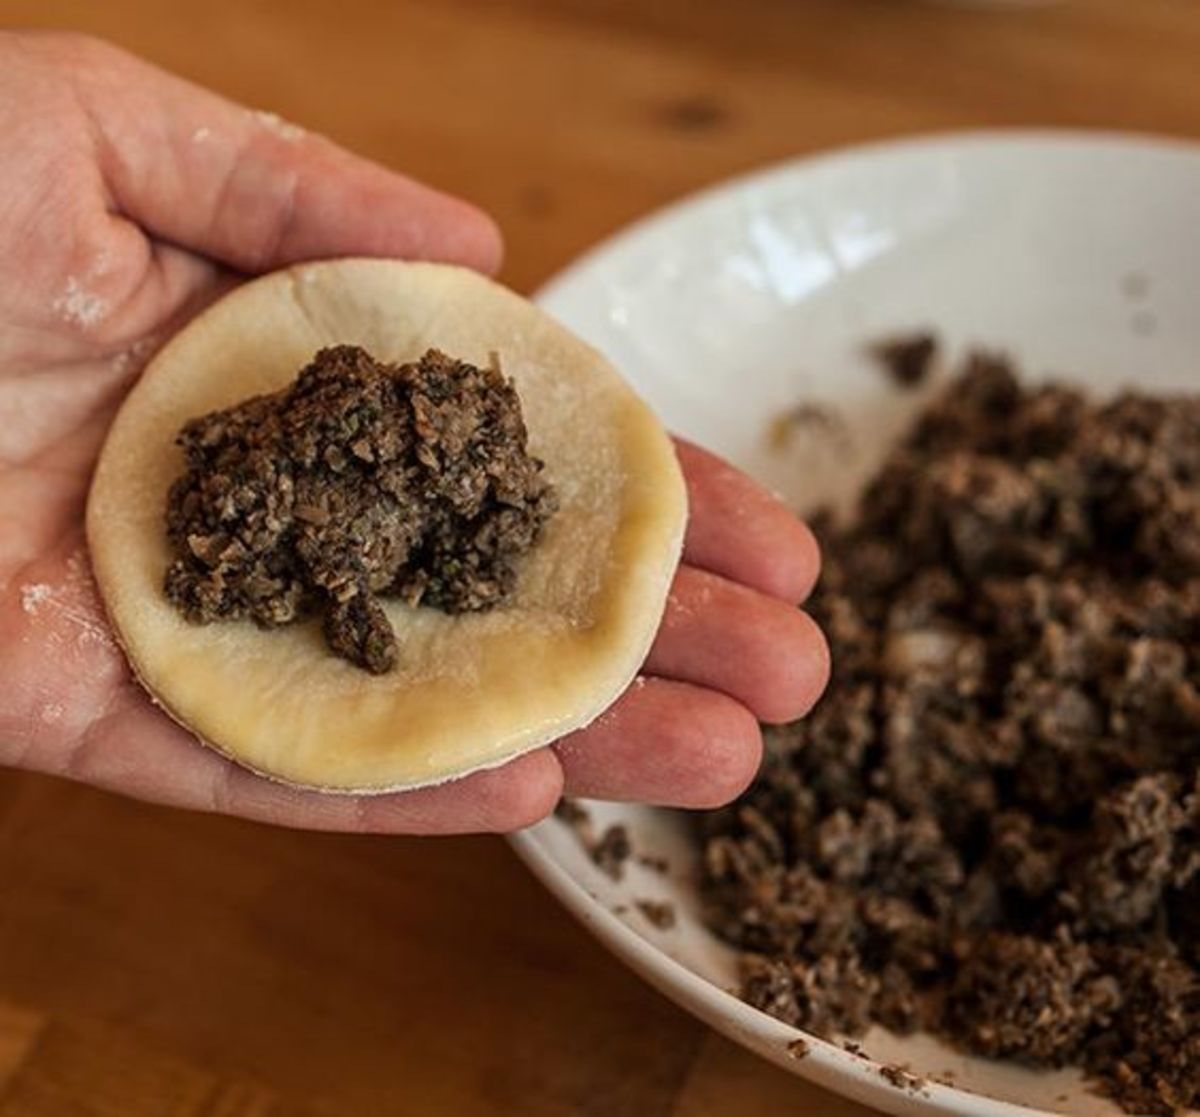 Mushrooms are a good filling for vegetarian pierogi.